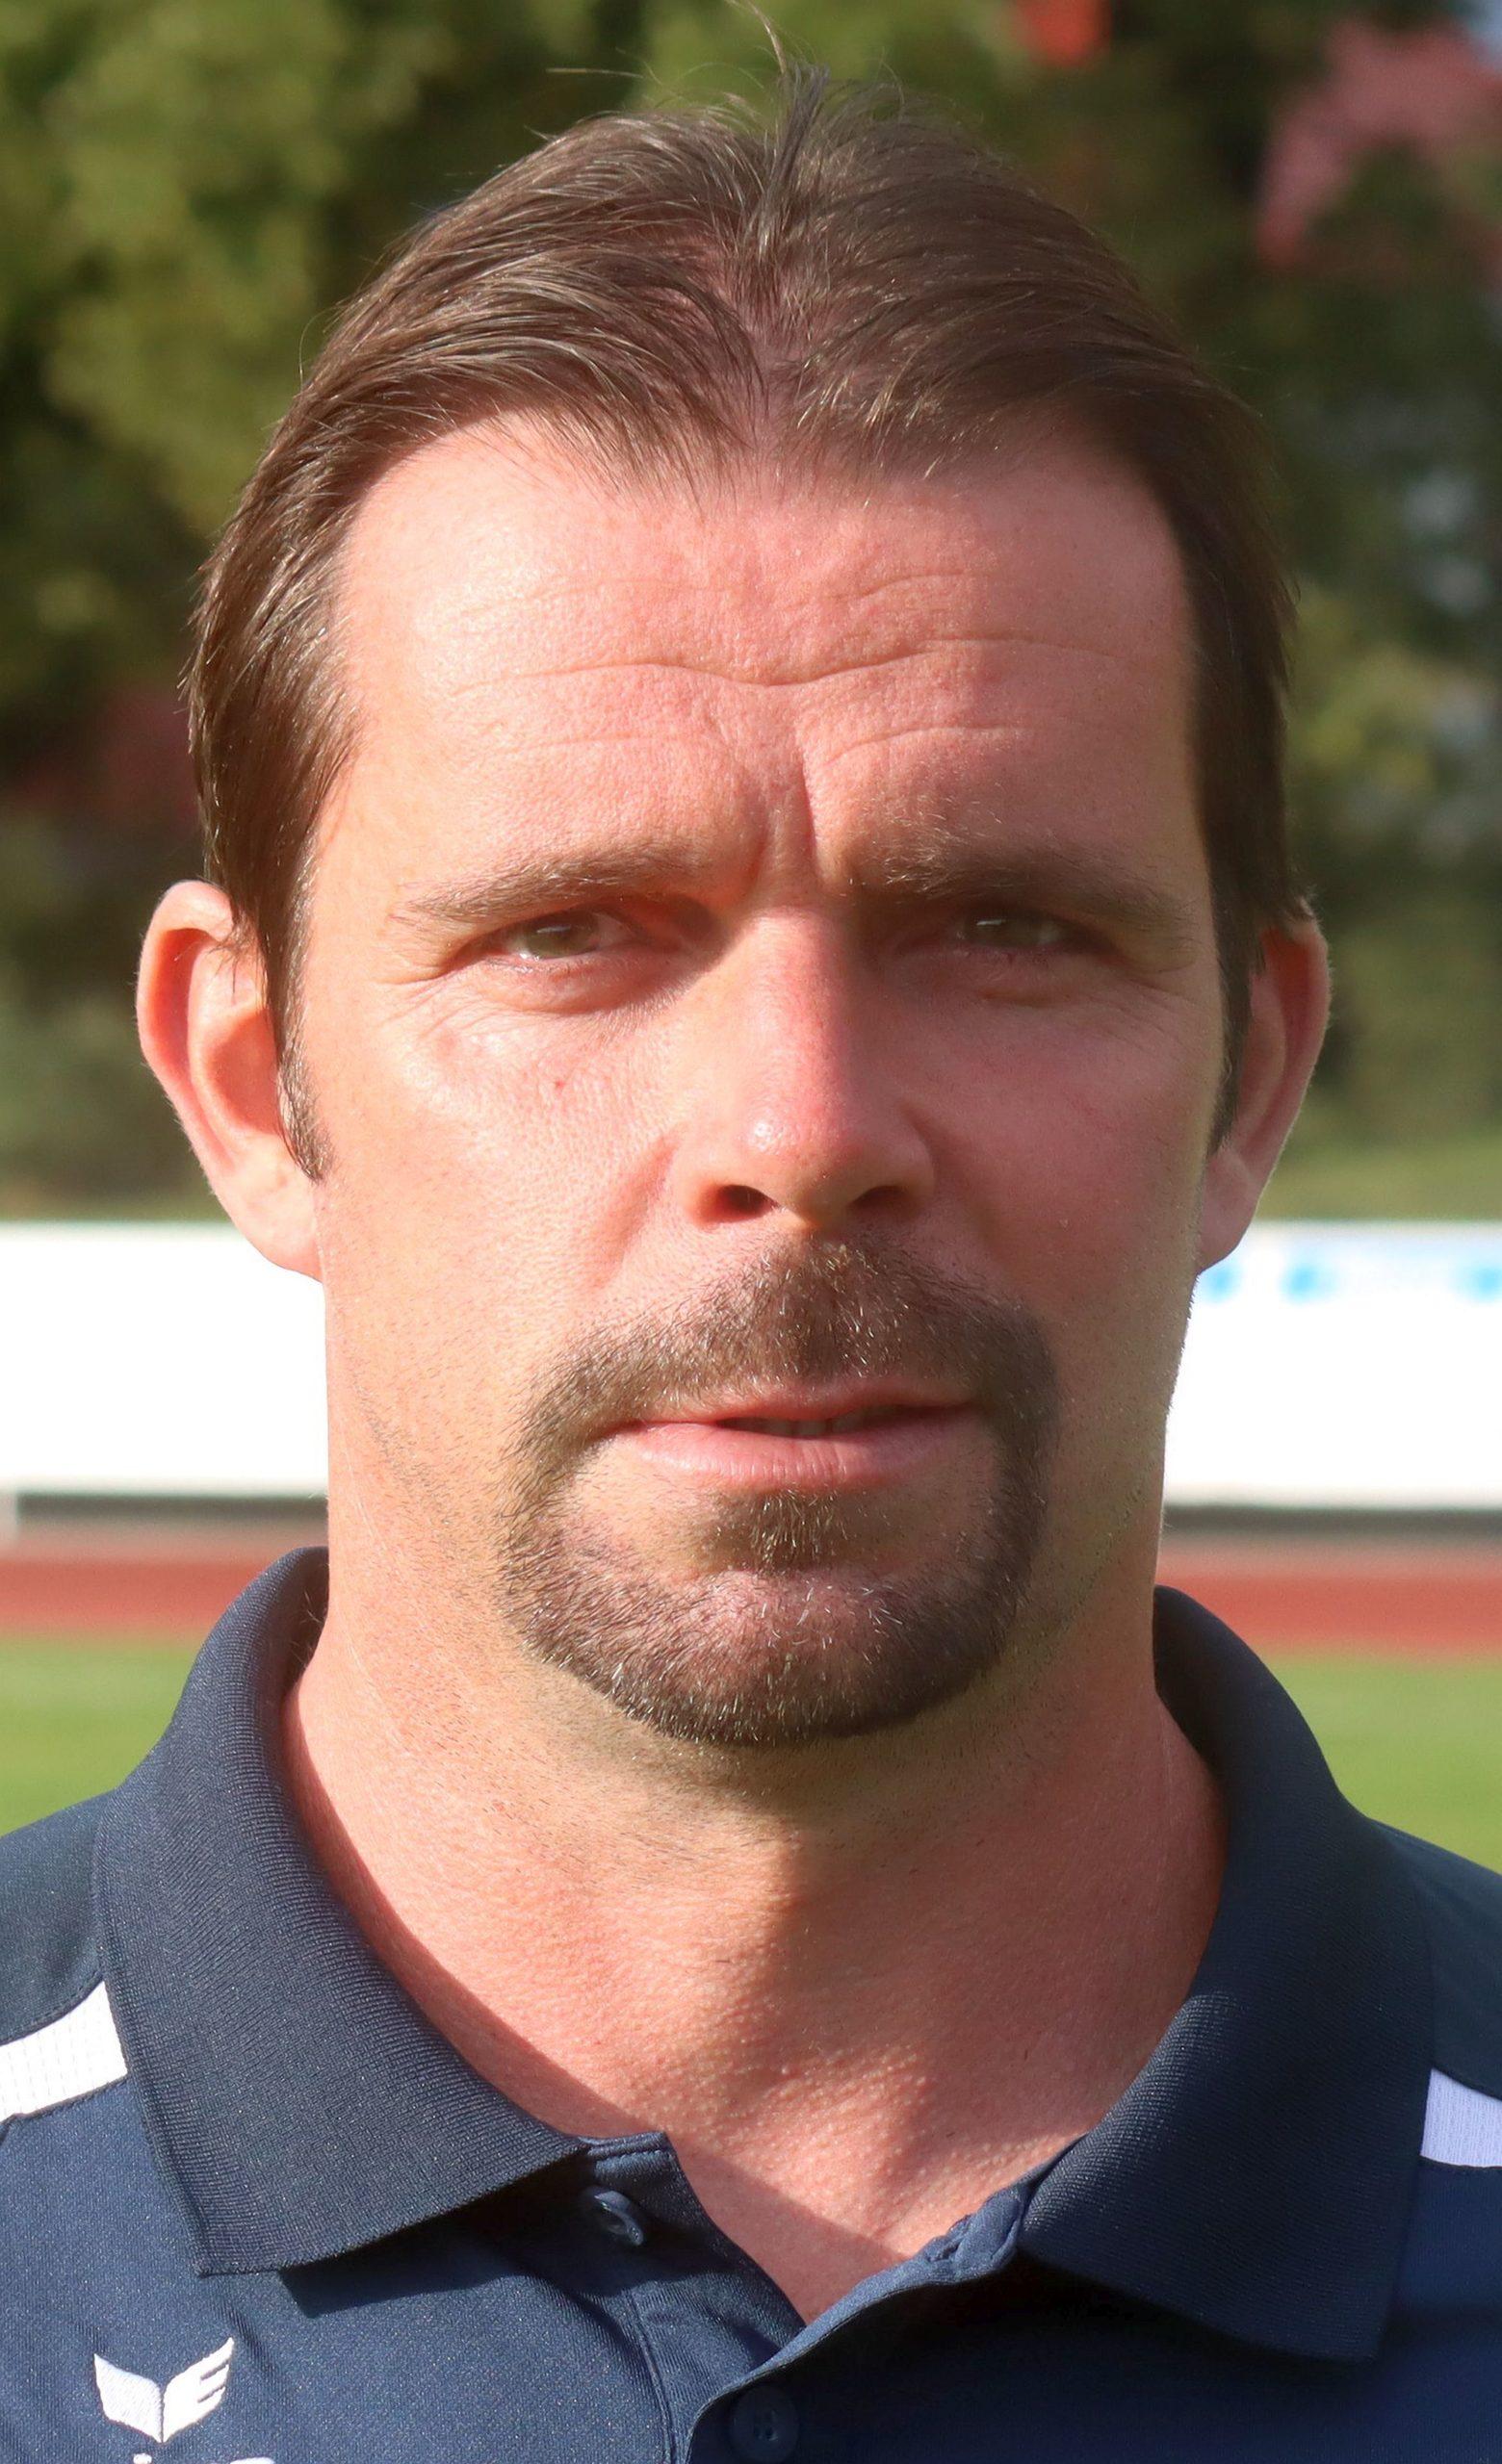 Michael Höcker